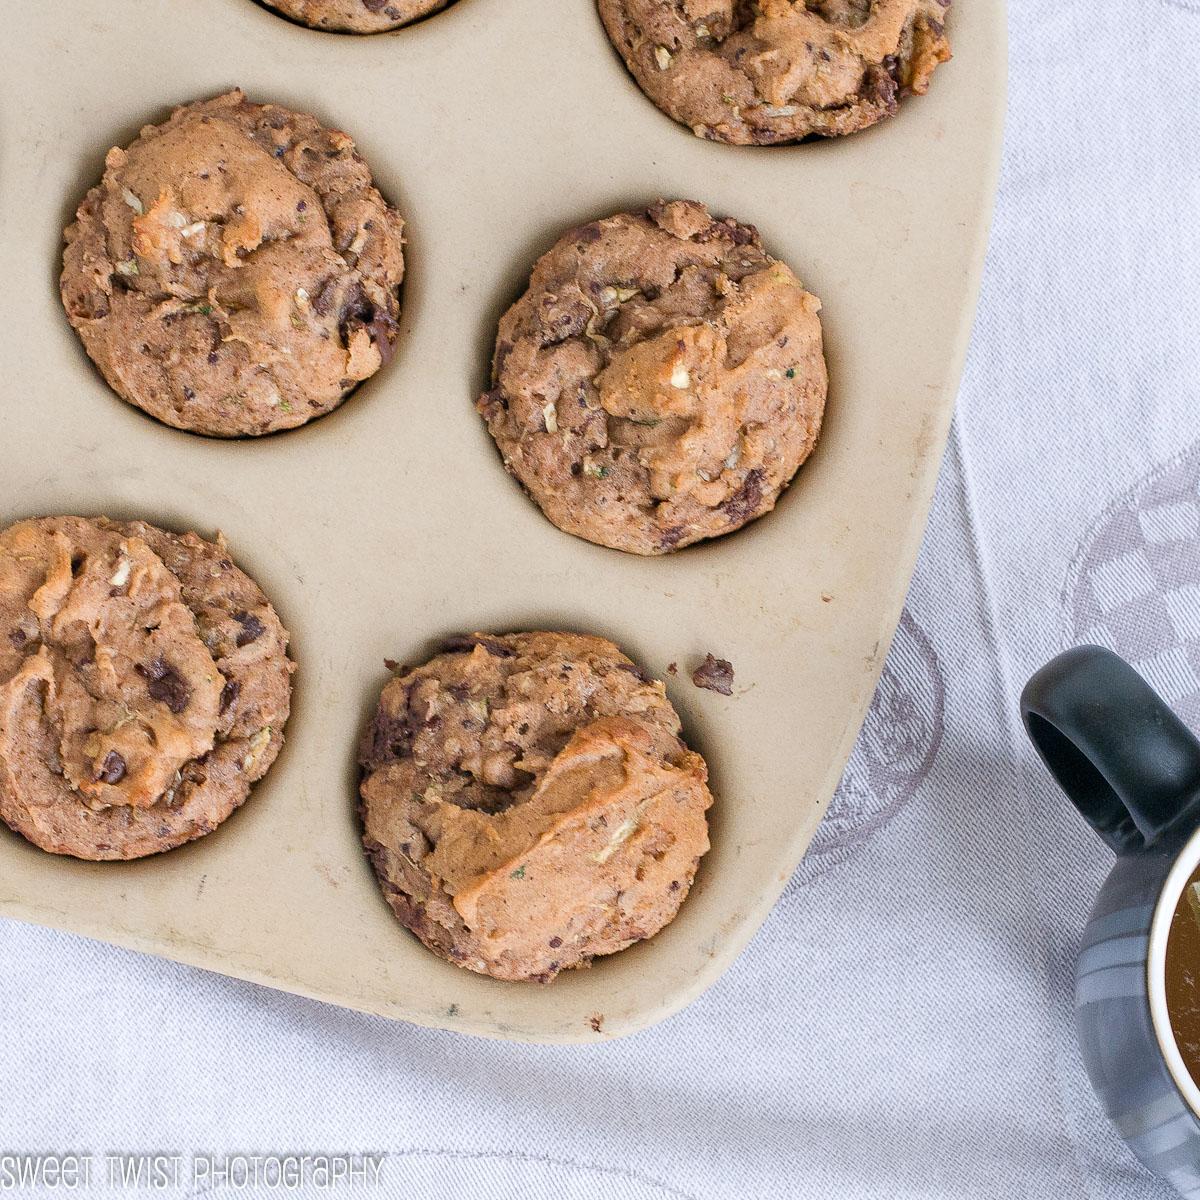 Gluten Free Chocolate Chip Walnut Zucchini Muffins